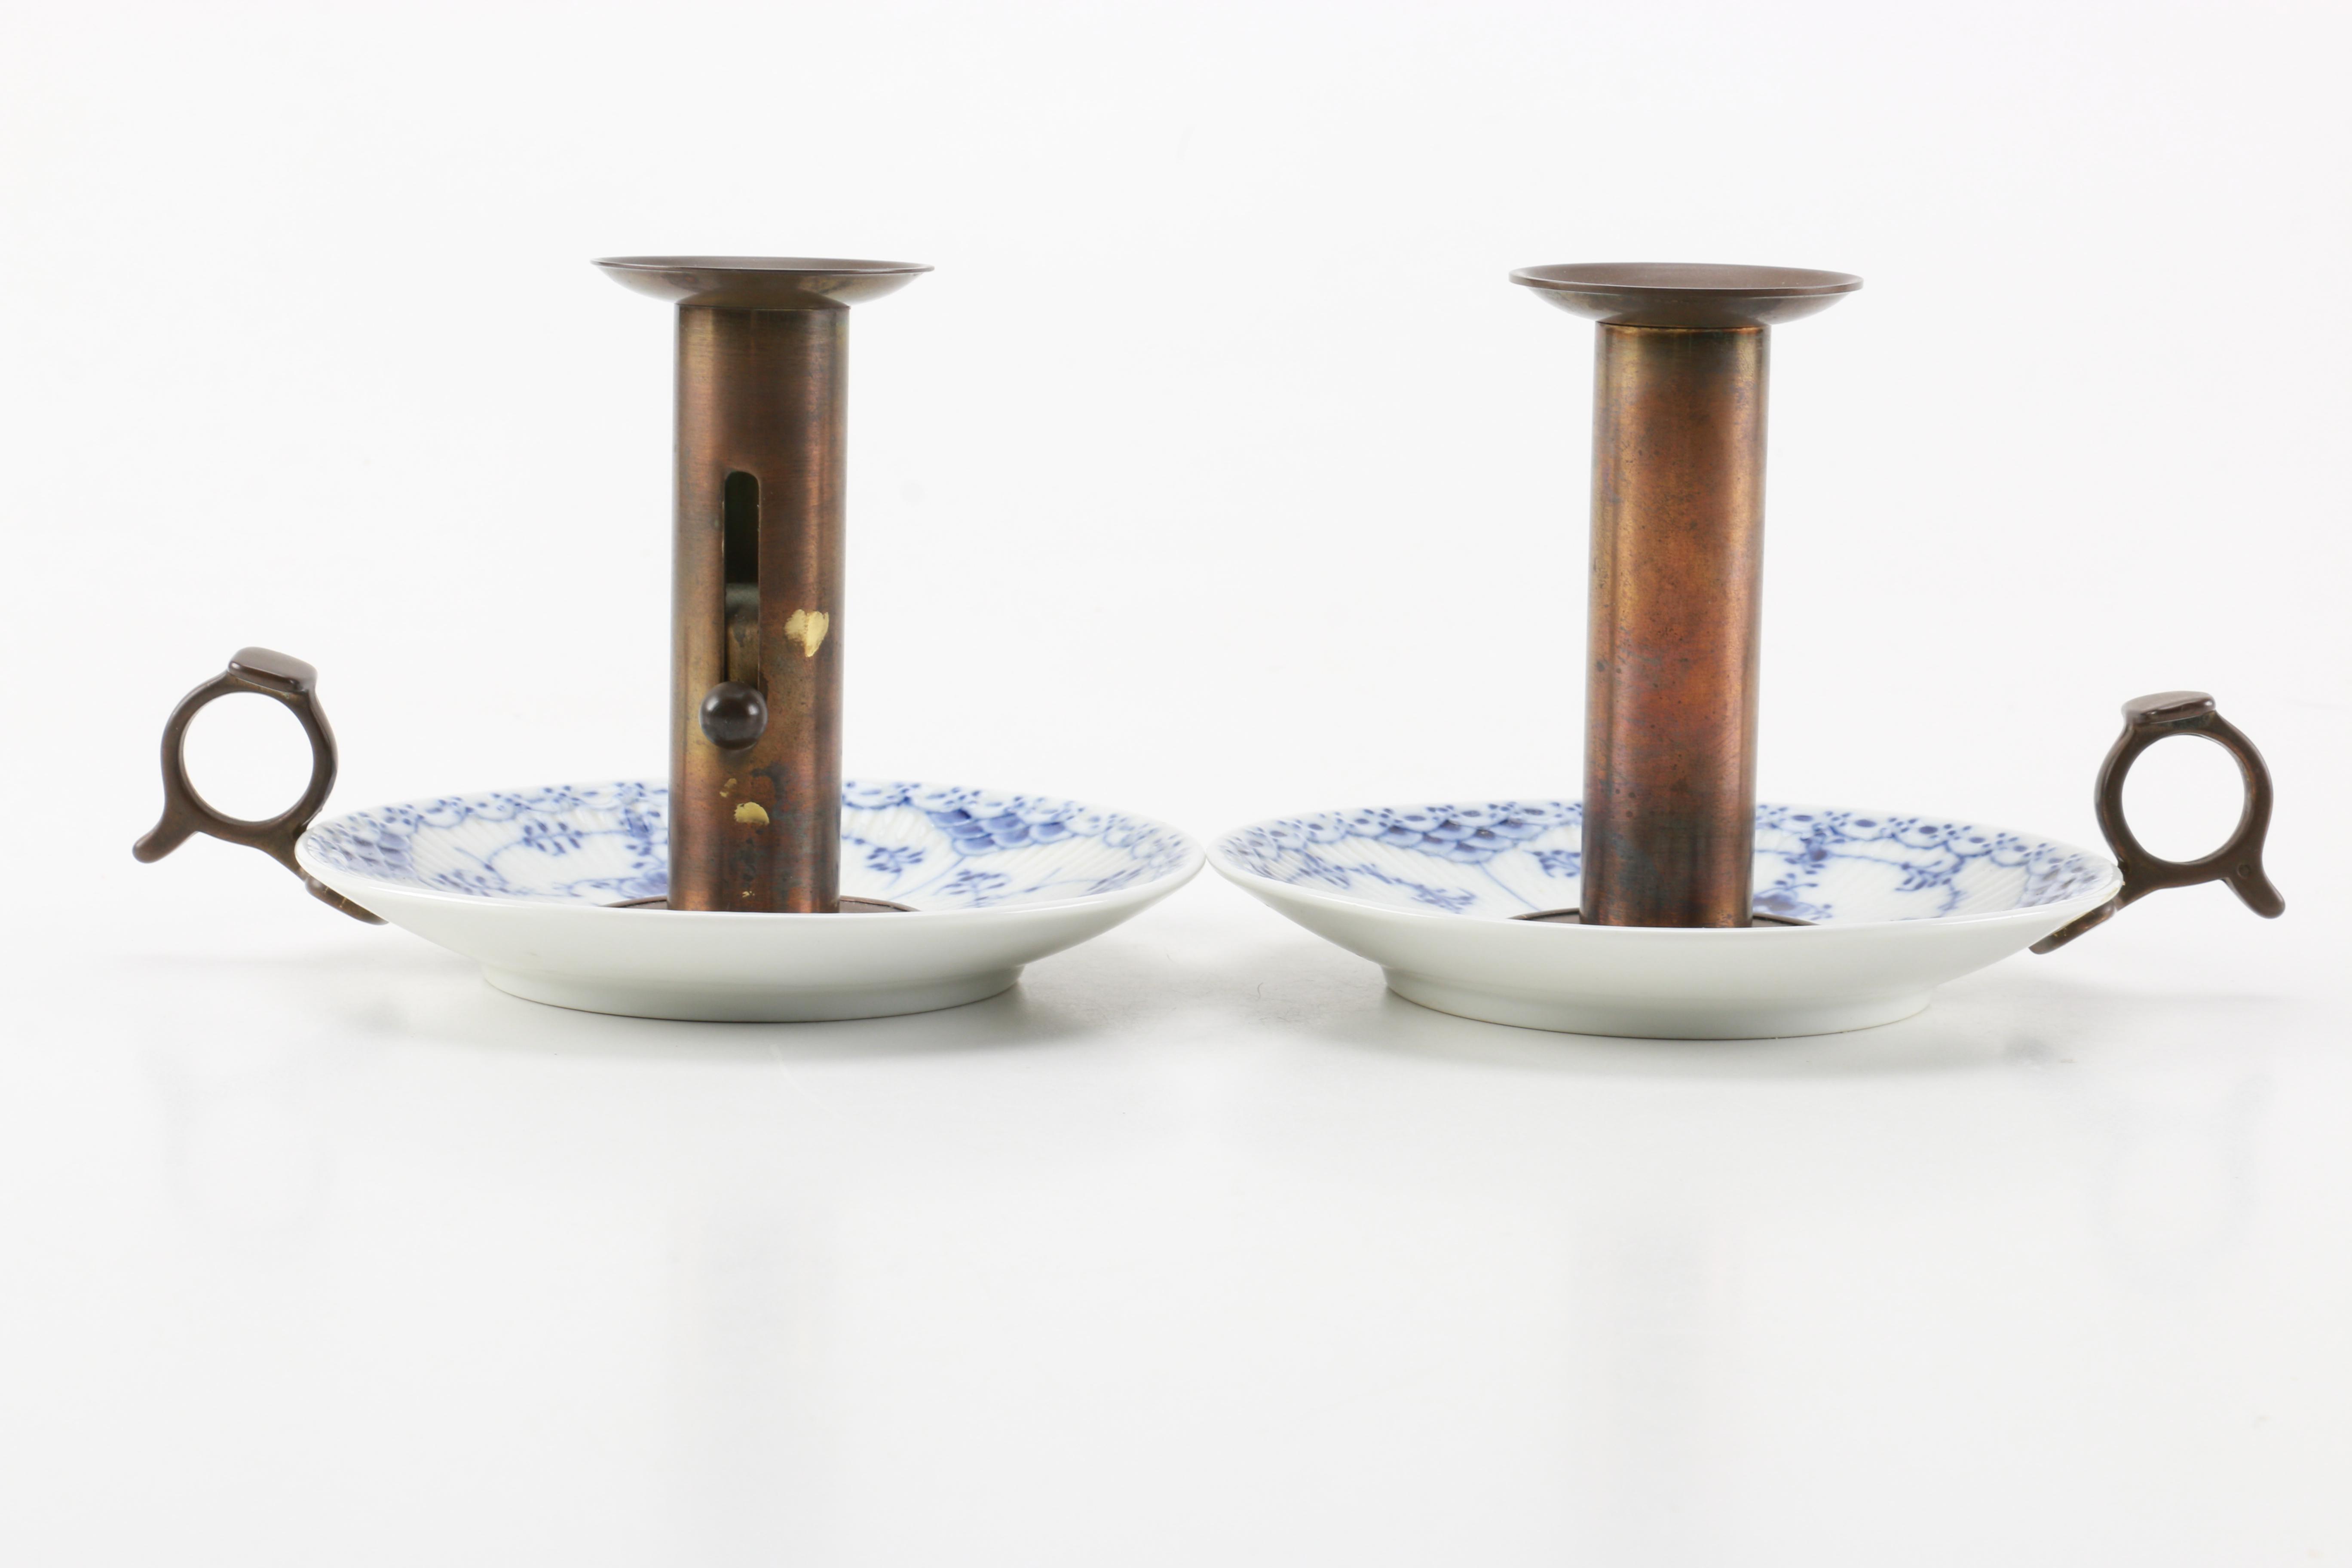 Pair of Brass and Porcelain Candlesticks by Royal Copenhagen